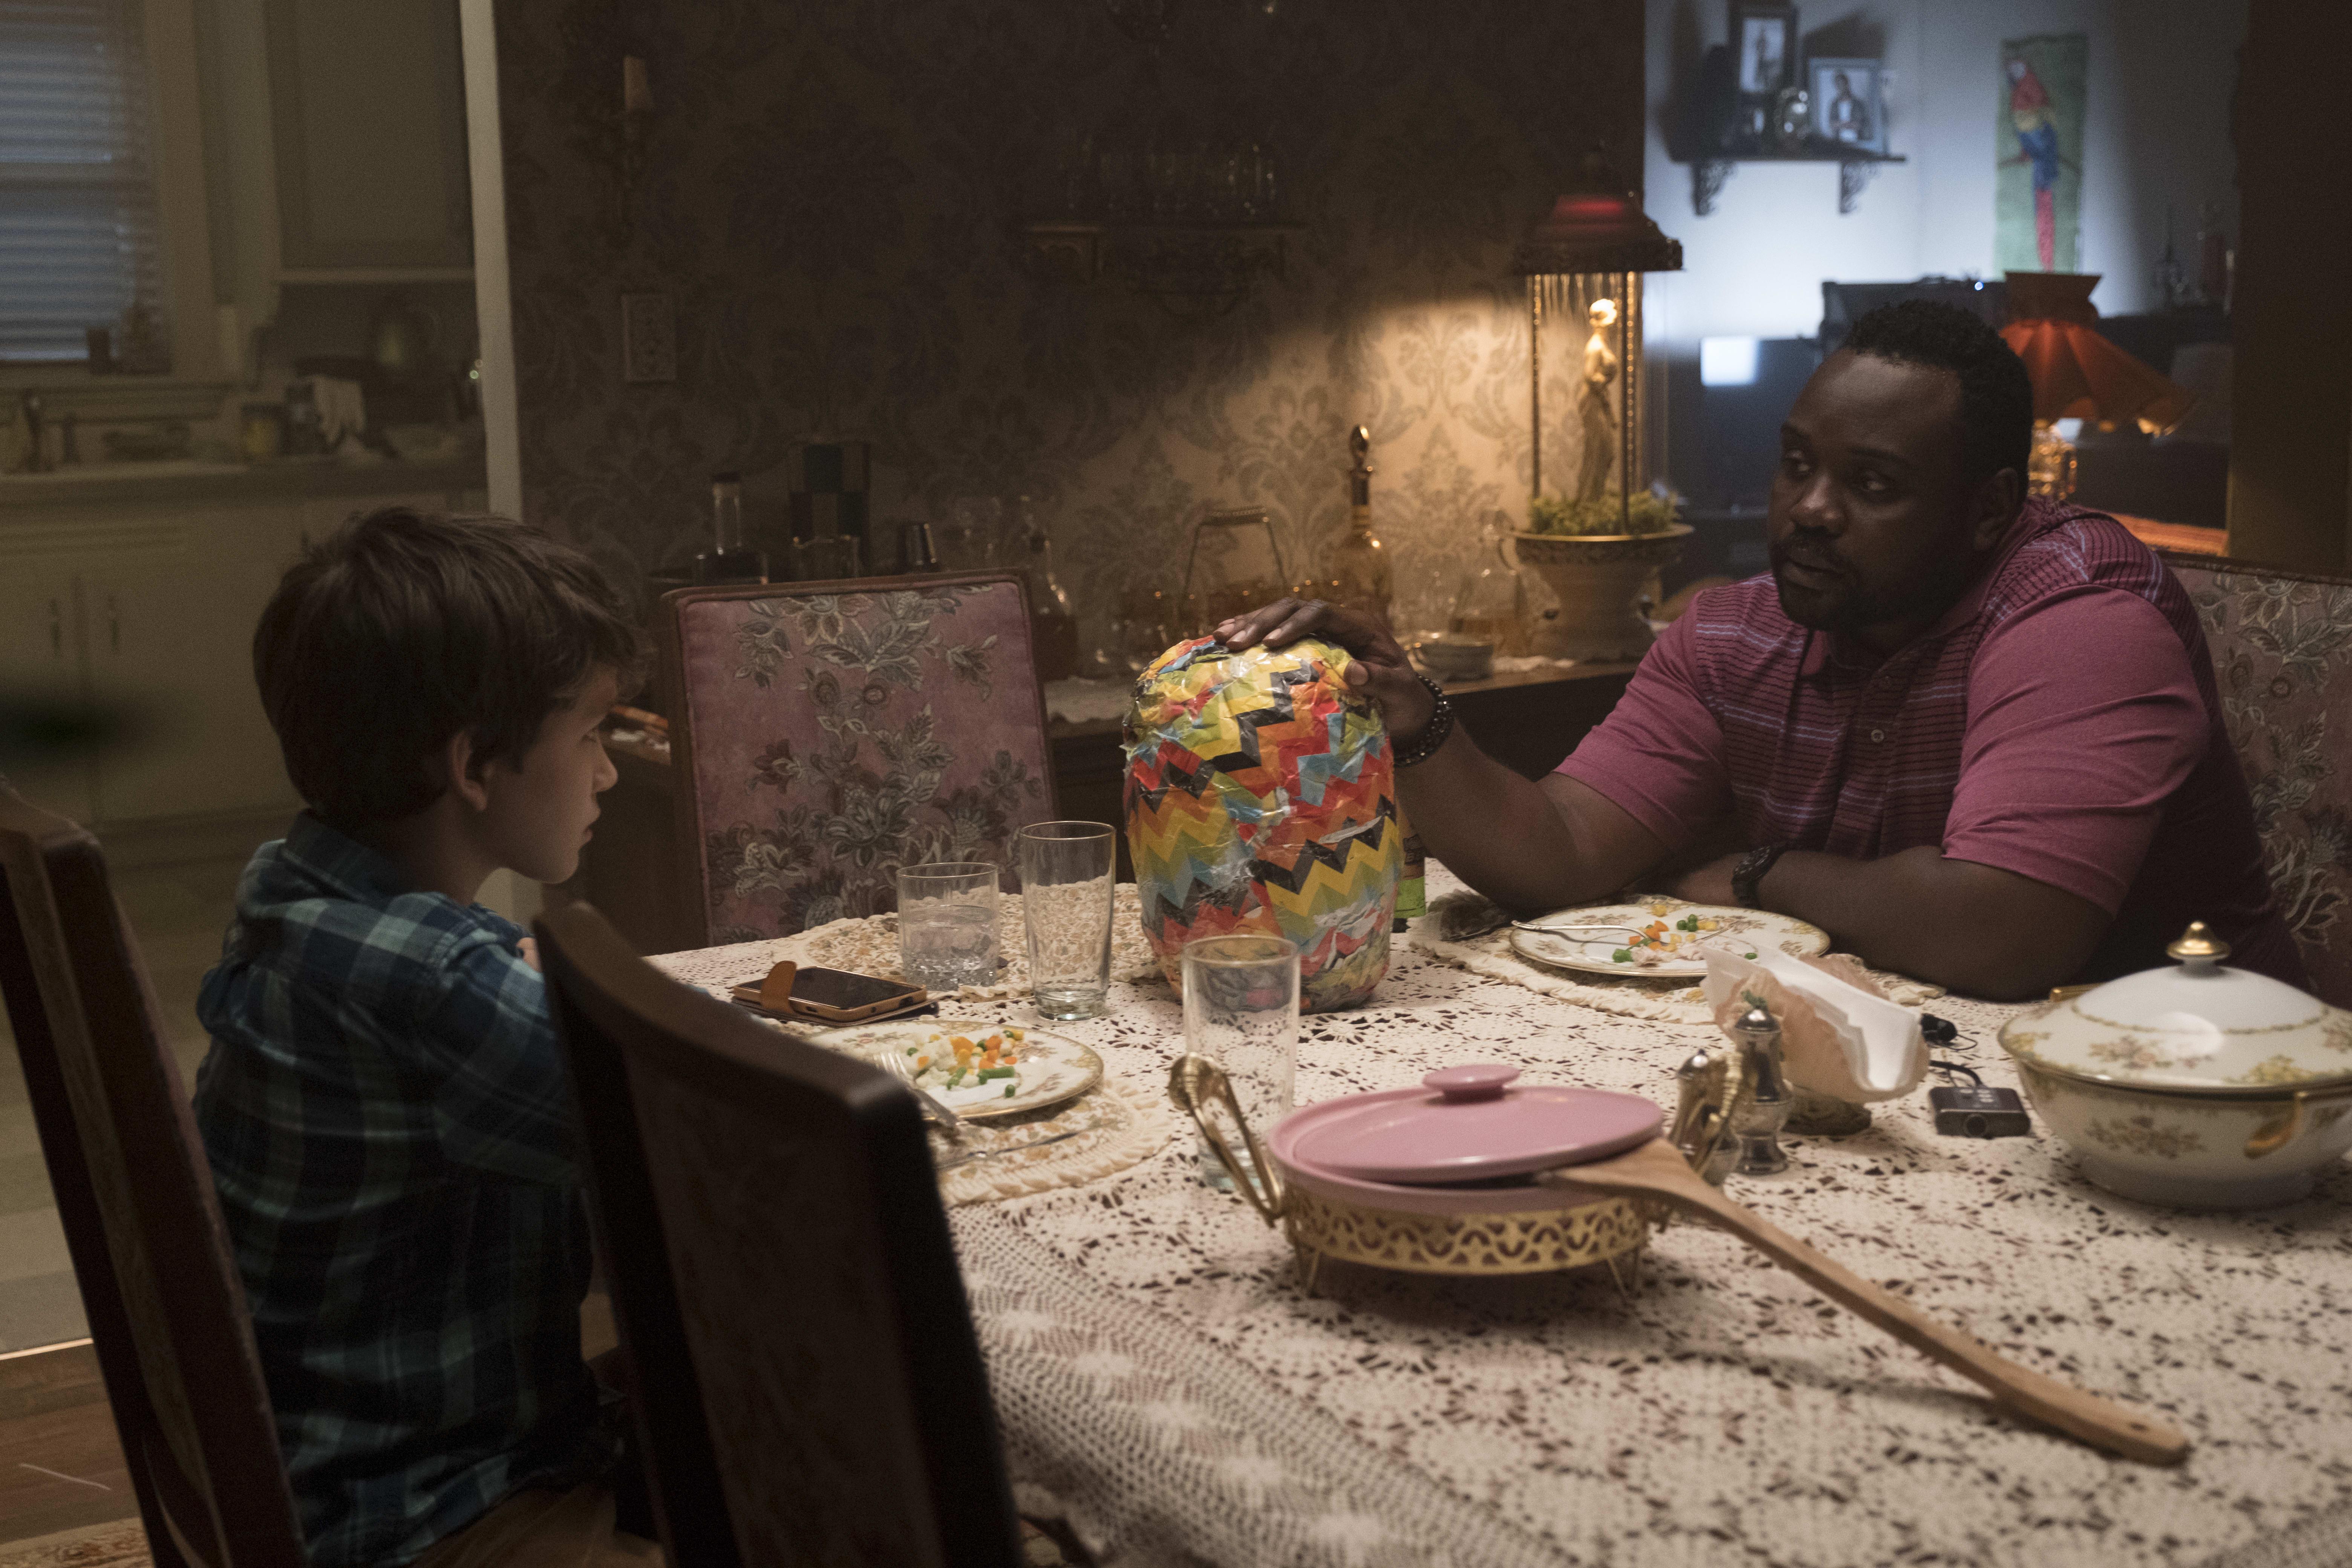 Child's Play movie photo via EPK.tv